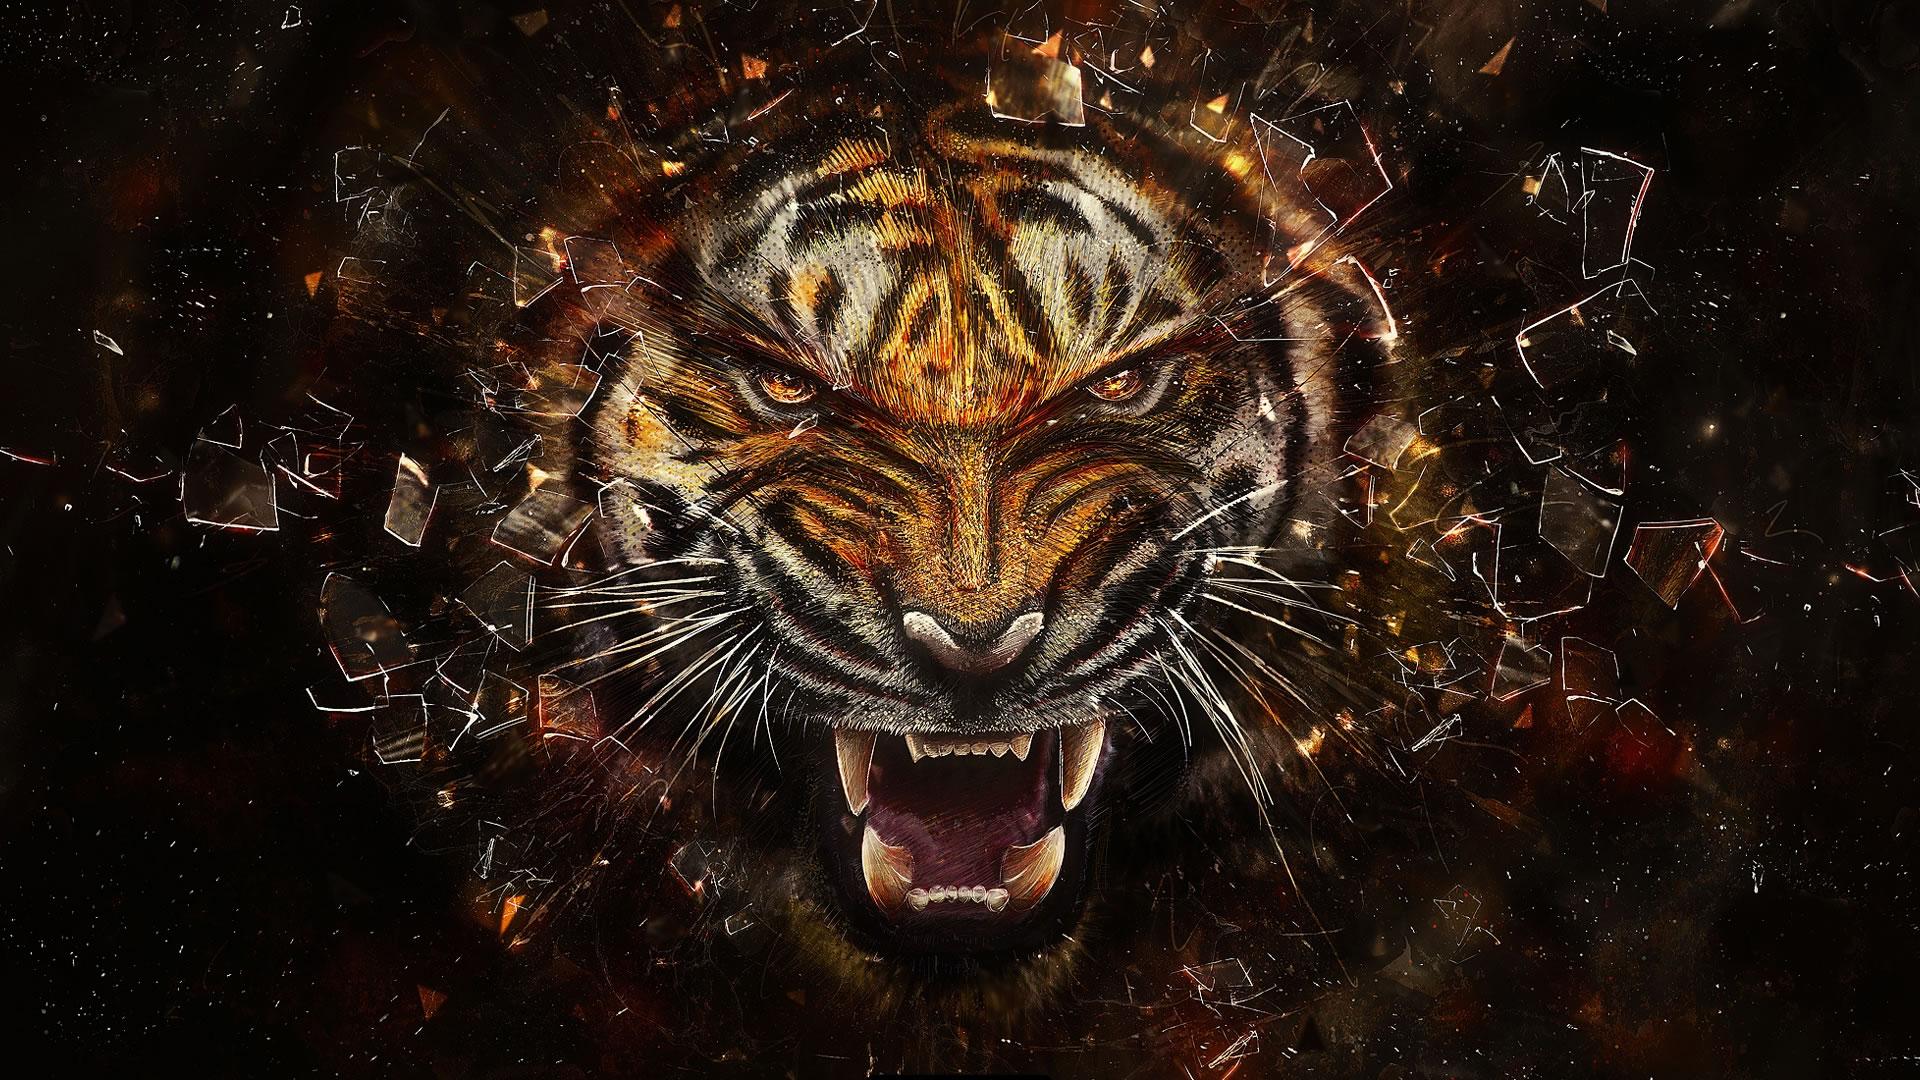 cool tiger design -#main